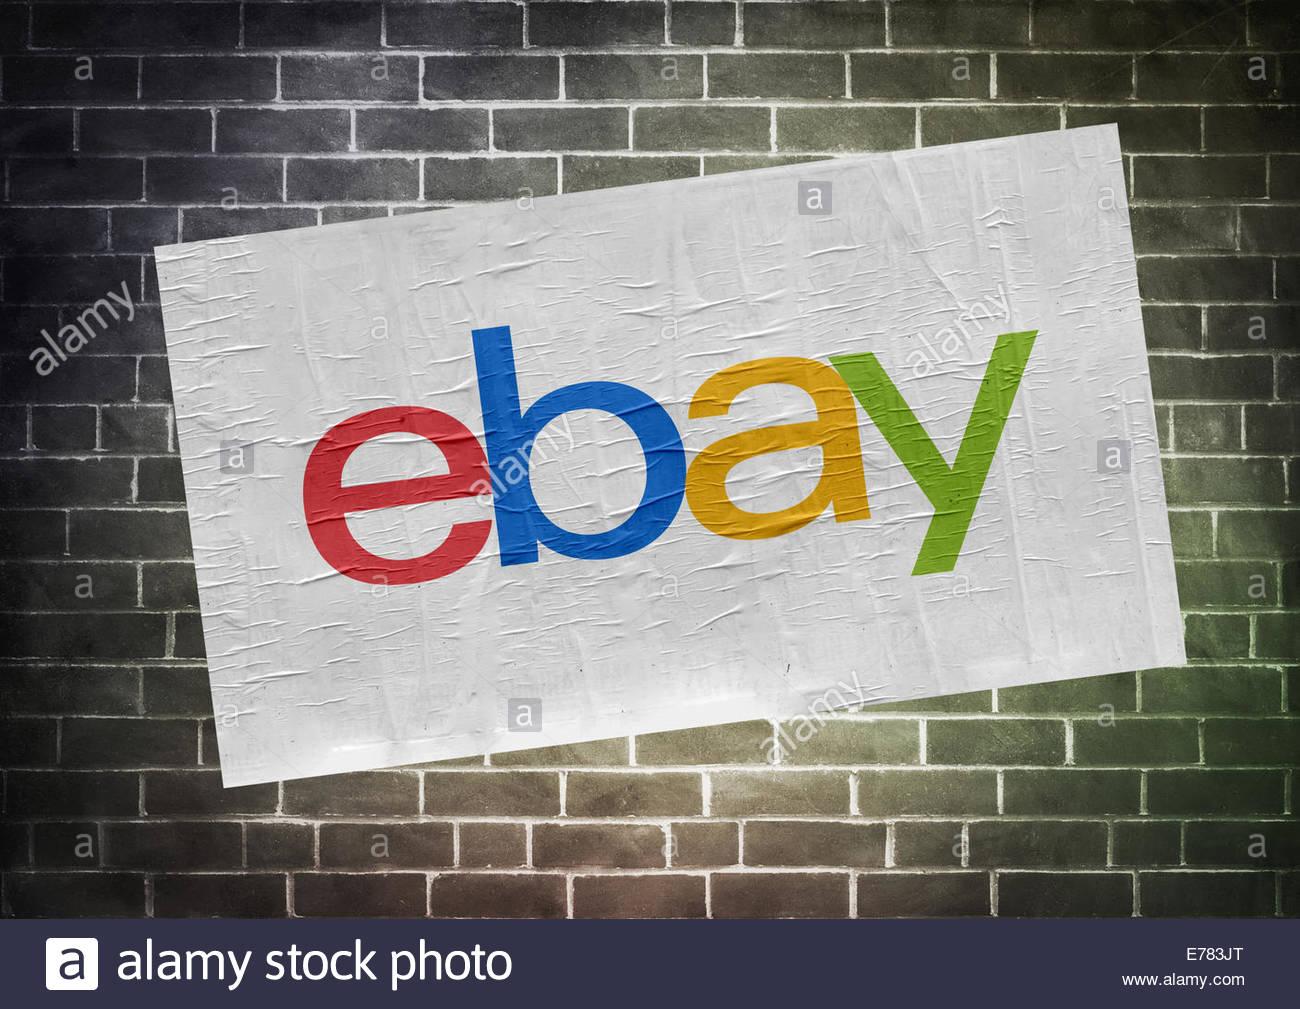 Ebay icon logo - poster concept - Stock Image